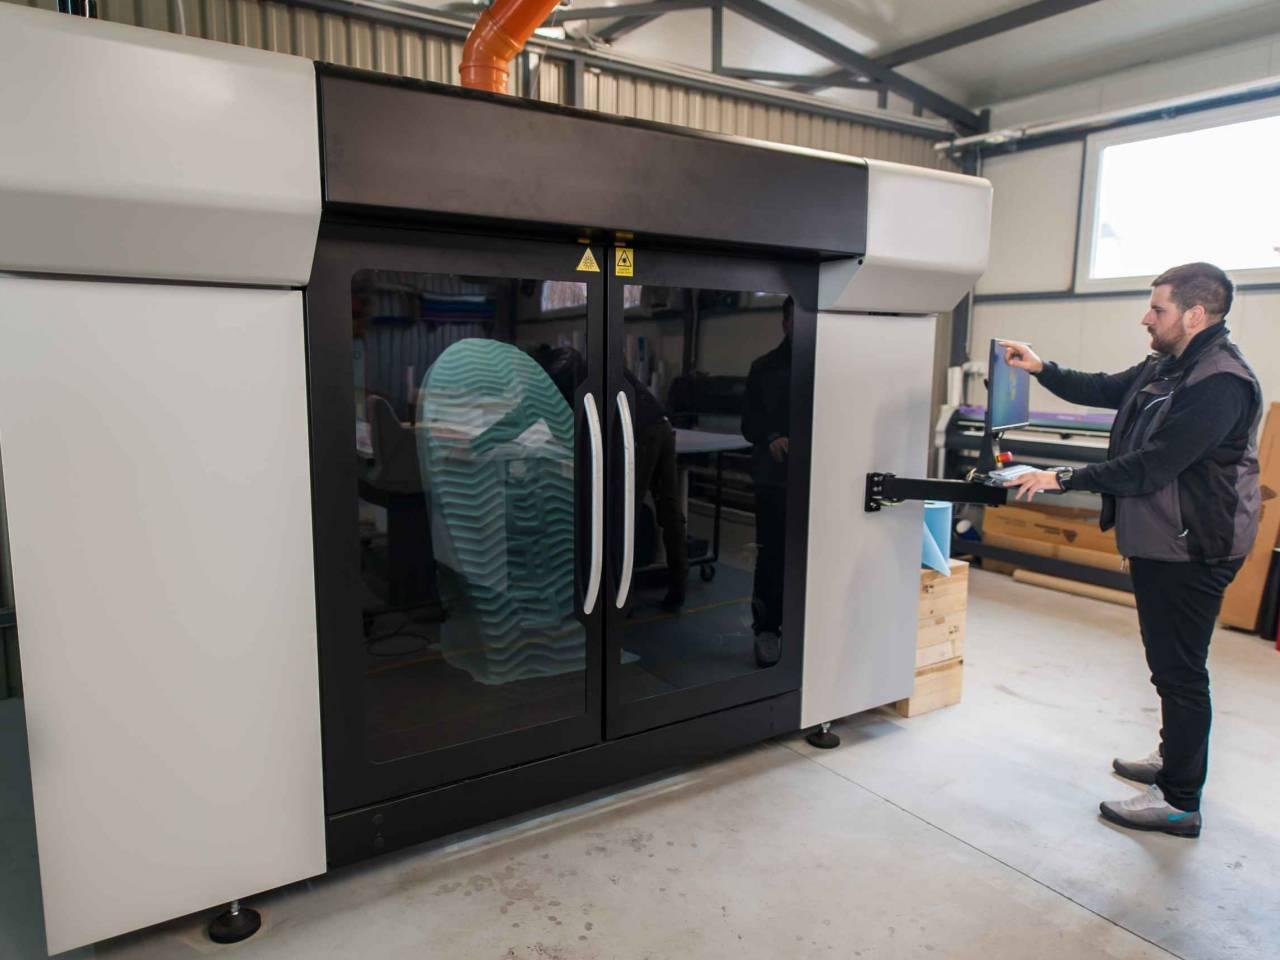 Printshop worker printmaker technician works on large modern 3d printer machine with computer control